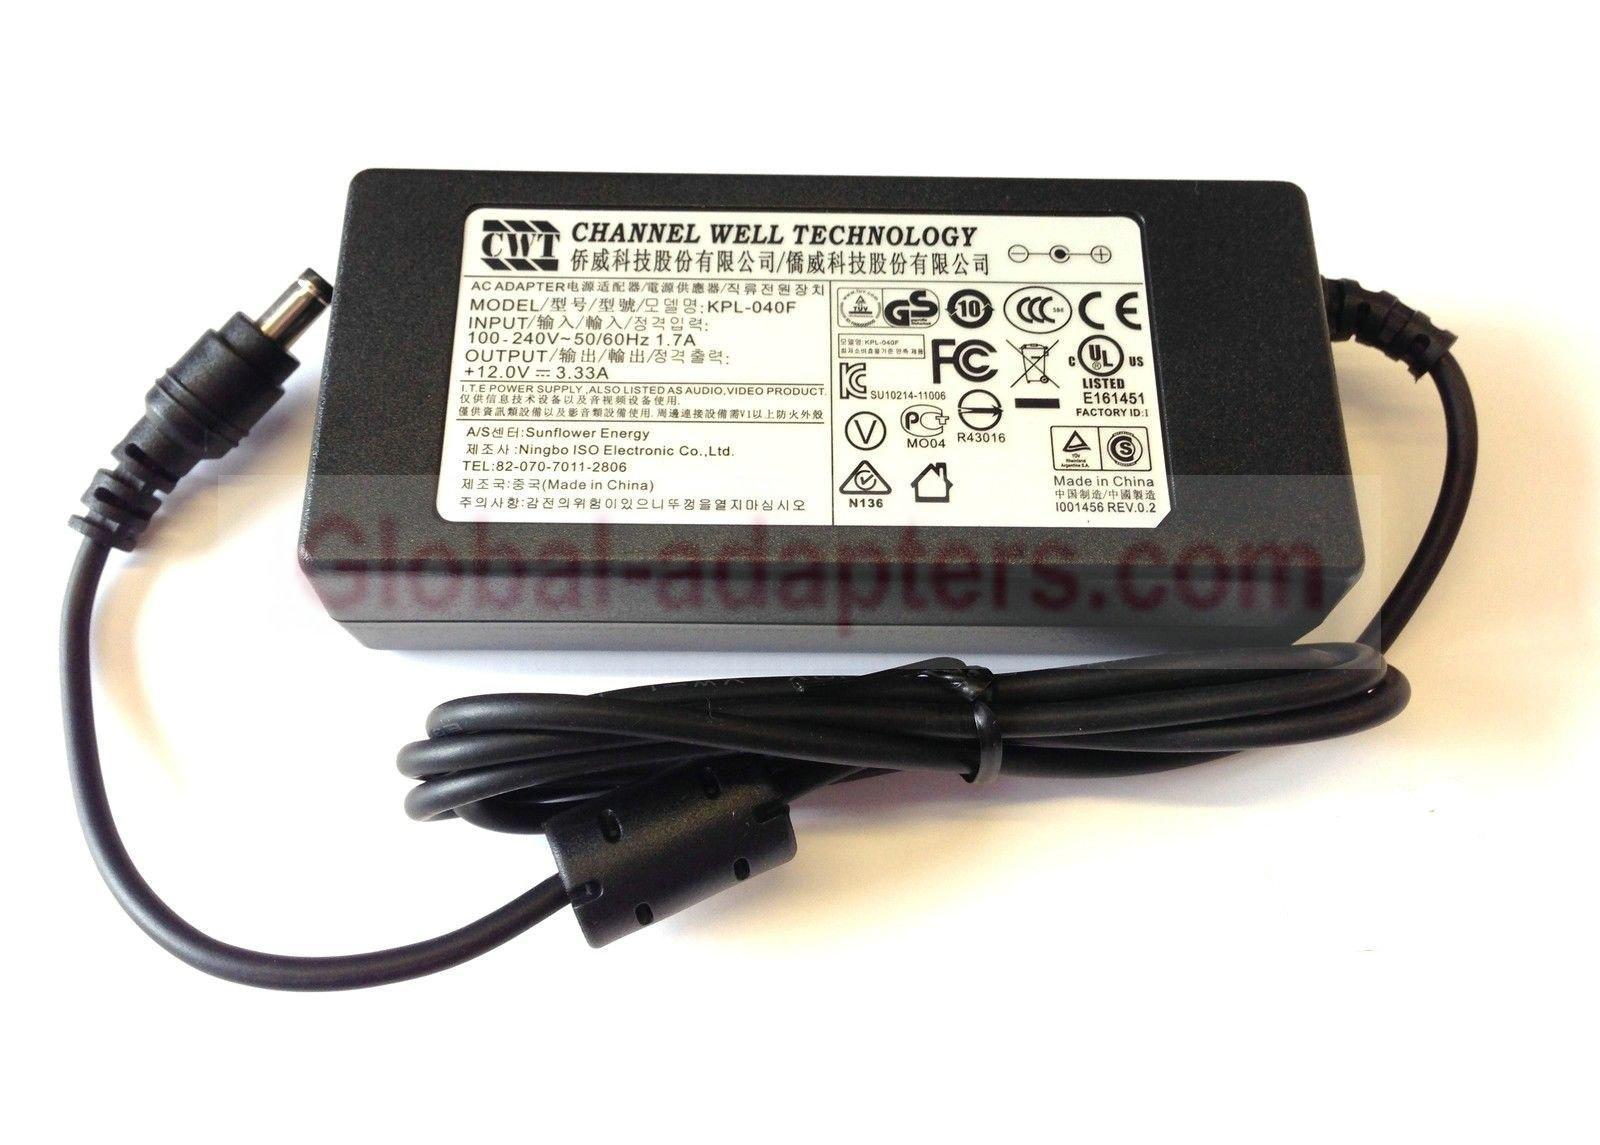 Brand New DVE 12V 2A DSA-24PFD-15 FUS 120200 AC adapter 30